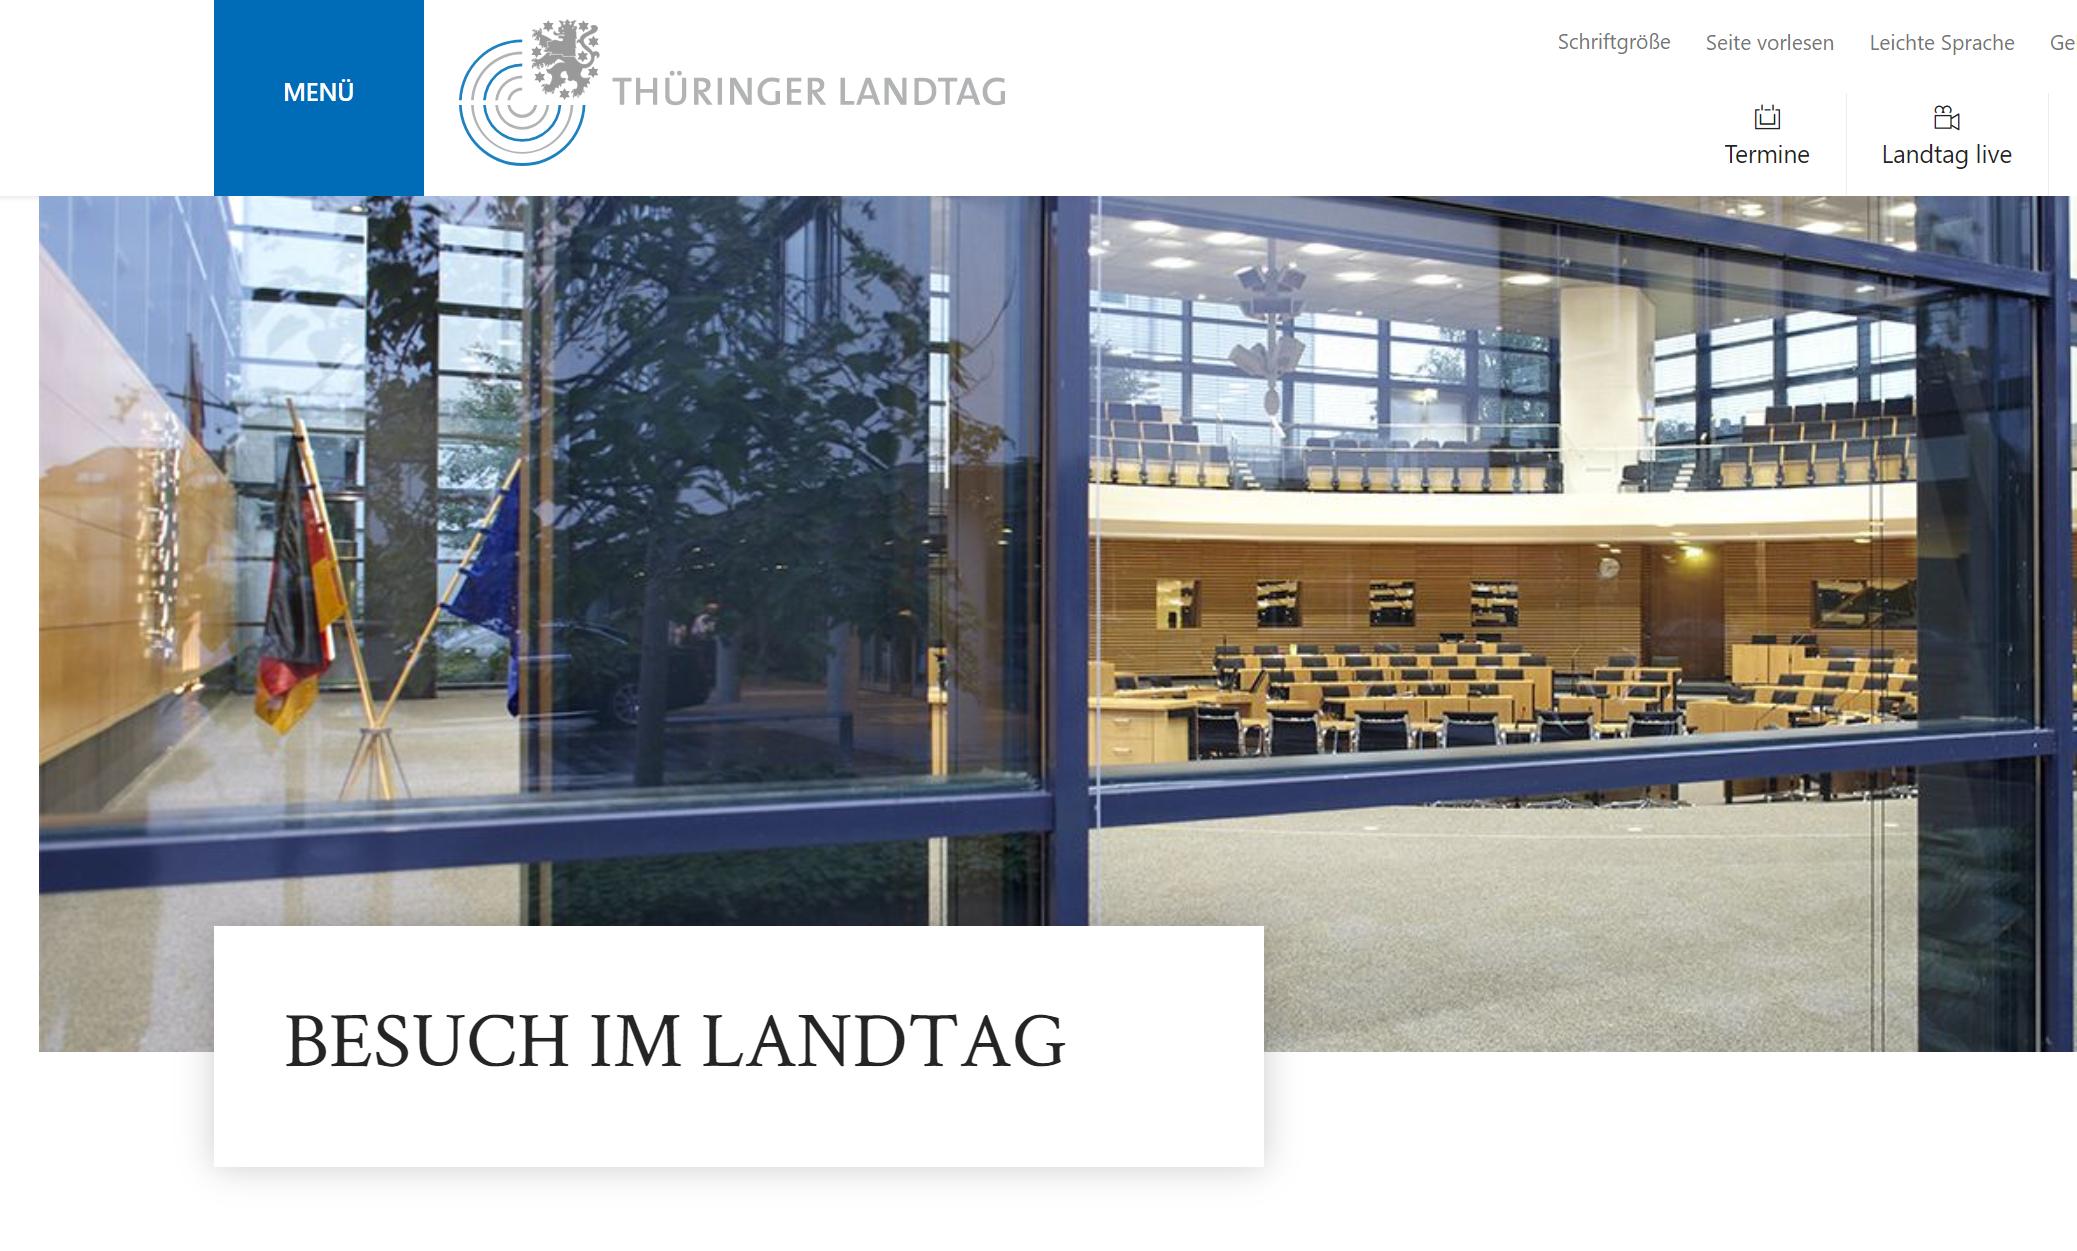 Mafia-Untersuchungsausschuss Landtag ThüringenErfurt